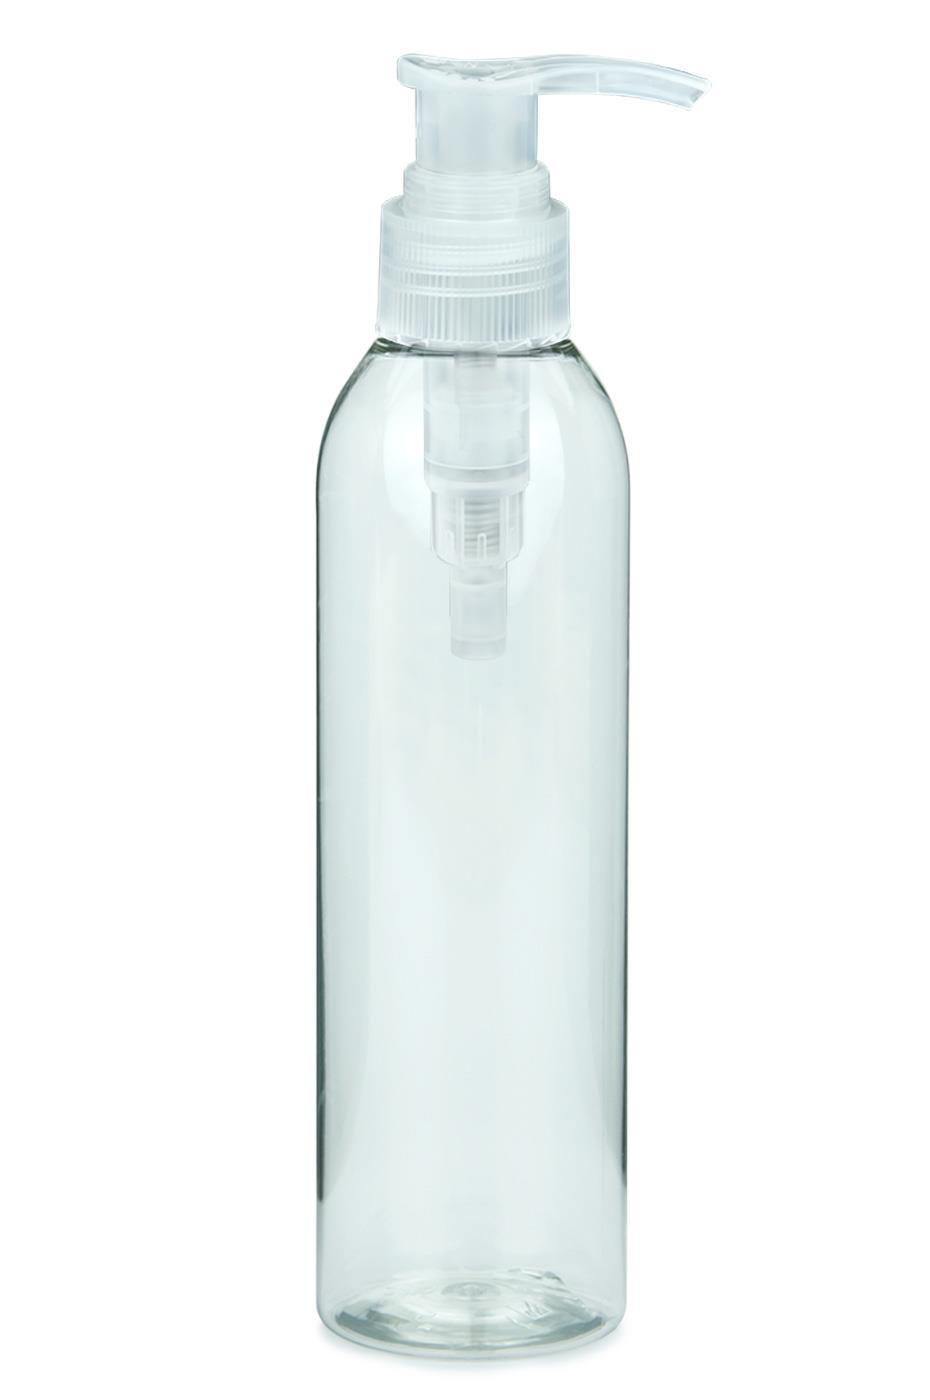 pet flasche aida 250 ml klar mit seifenpumpe natur 24 410 klar. Black Bedroom Furniture Sets. Home Design Ideas